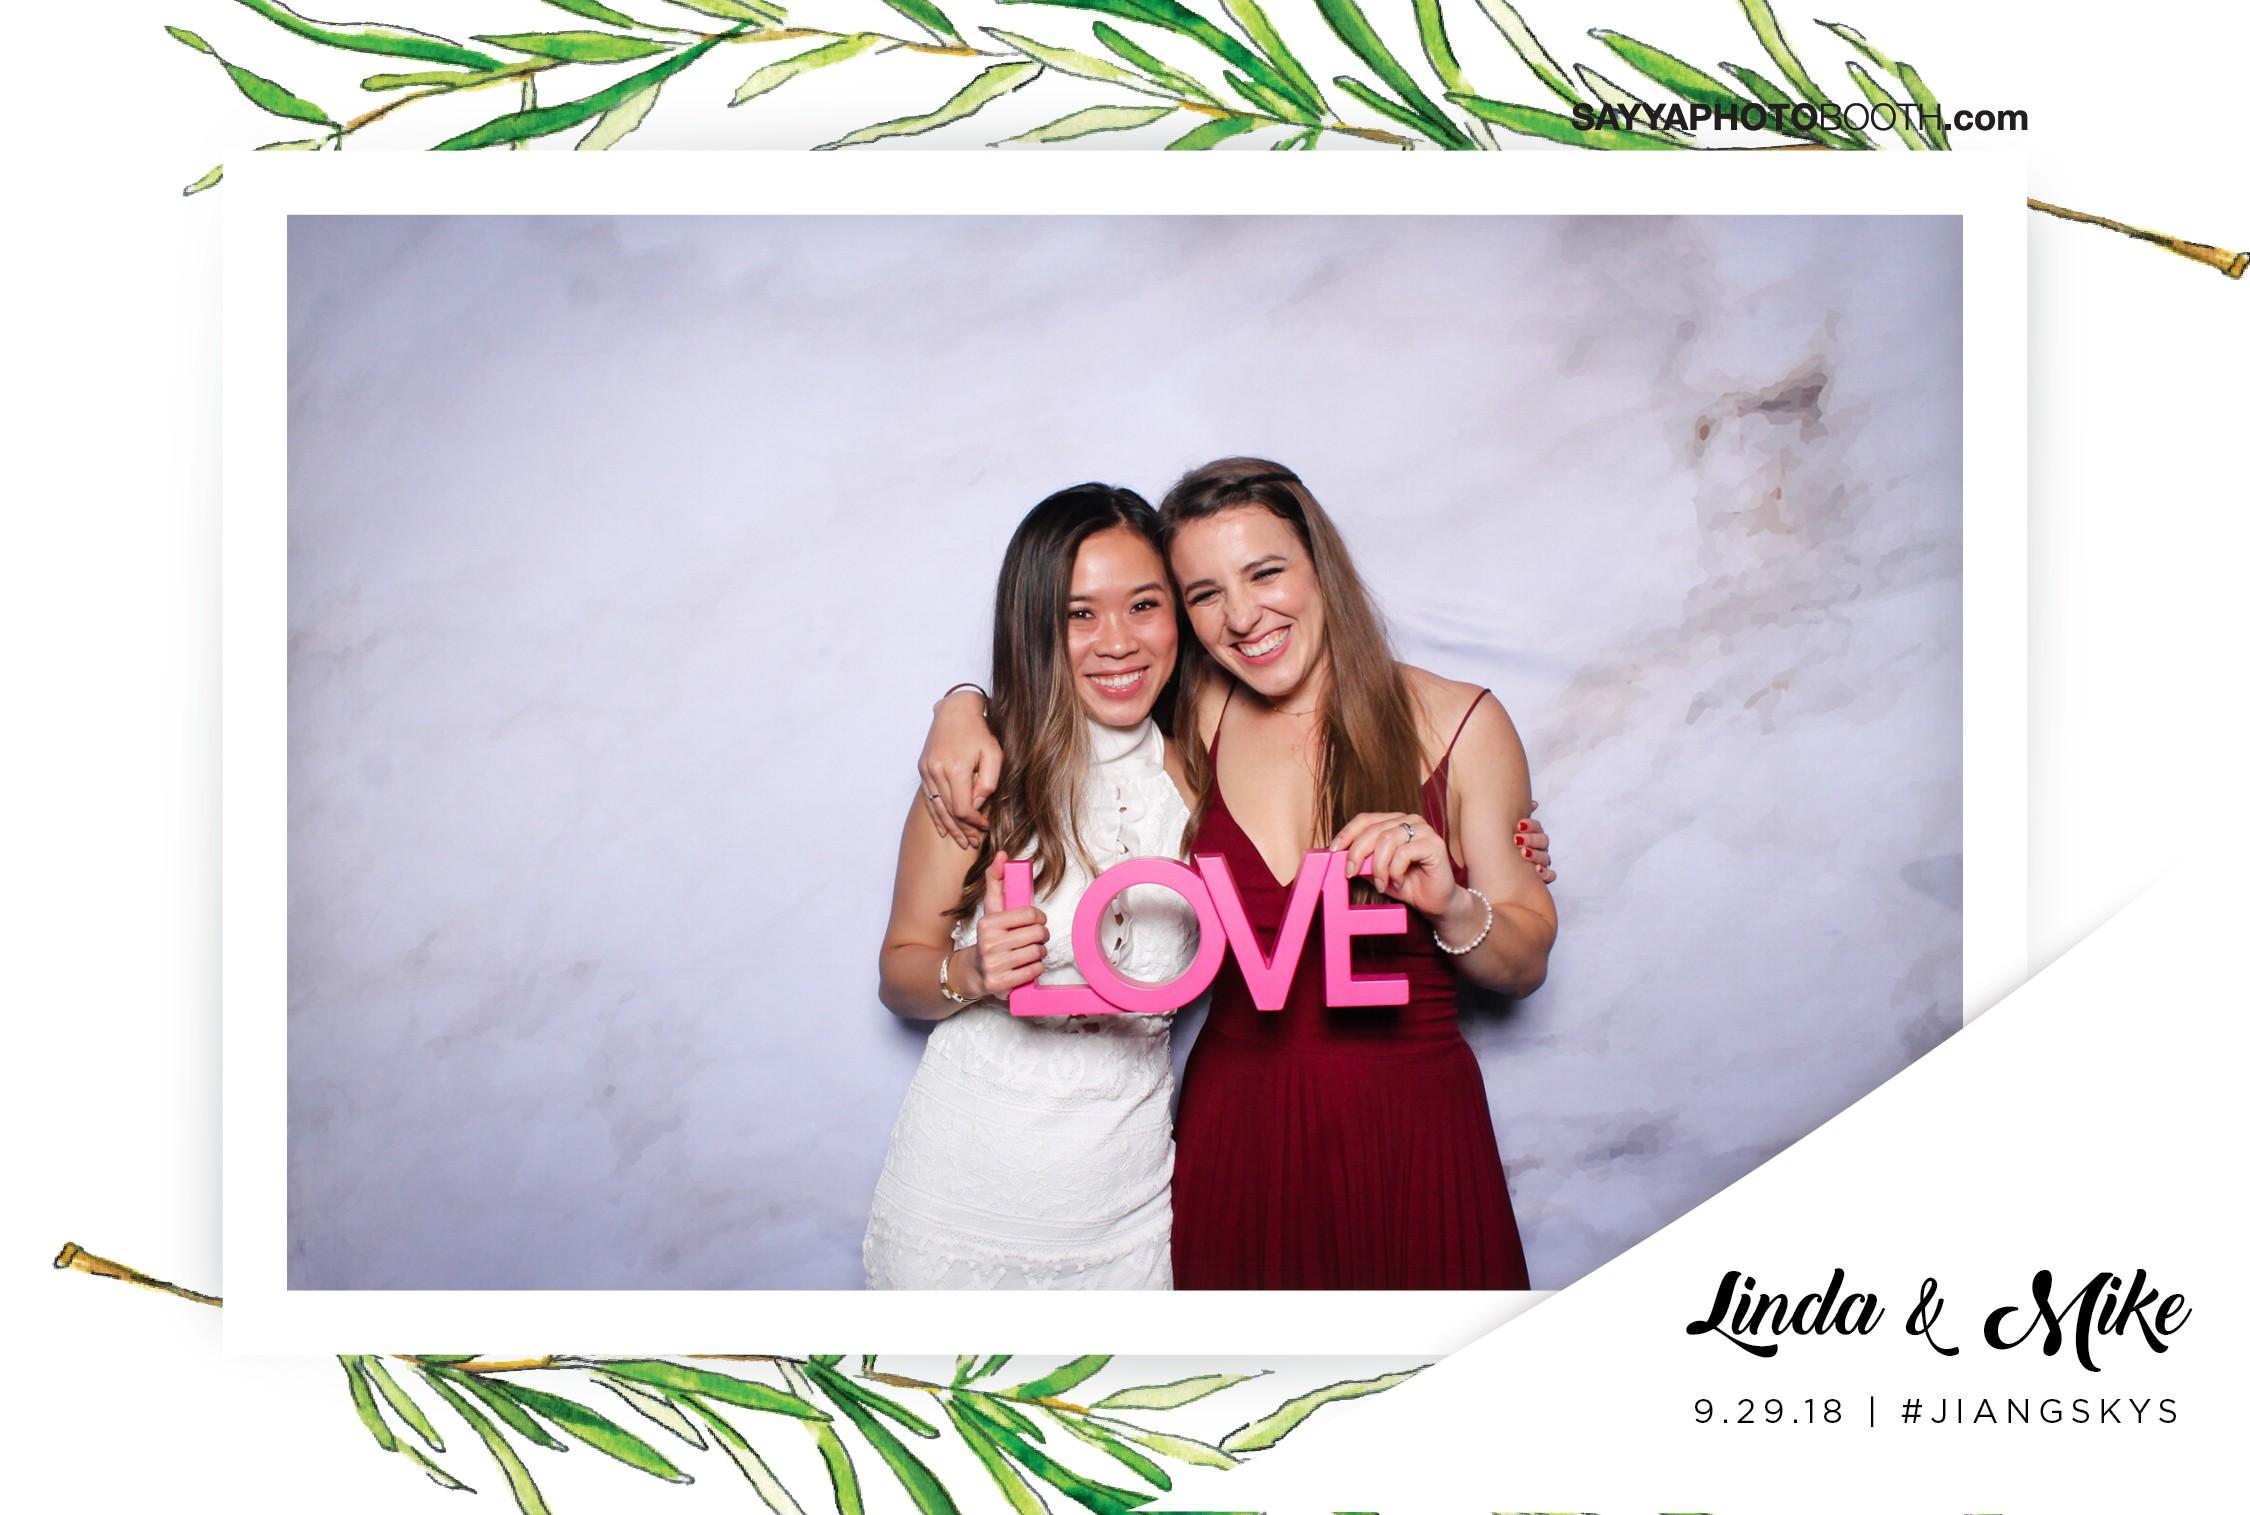 Linda and Mike's Wedding